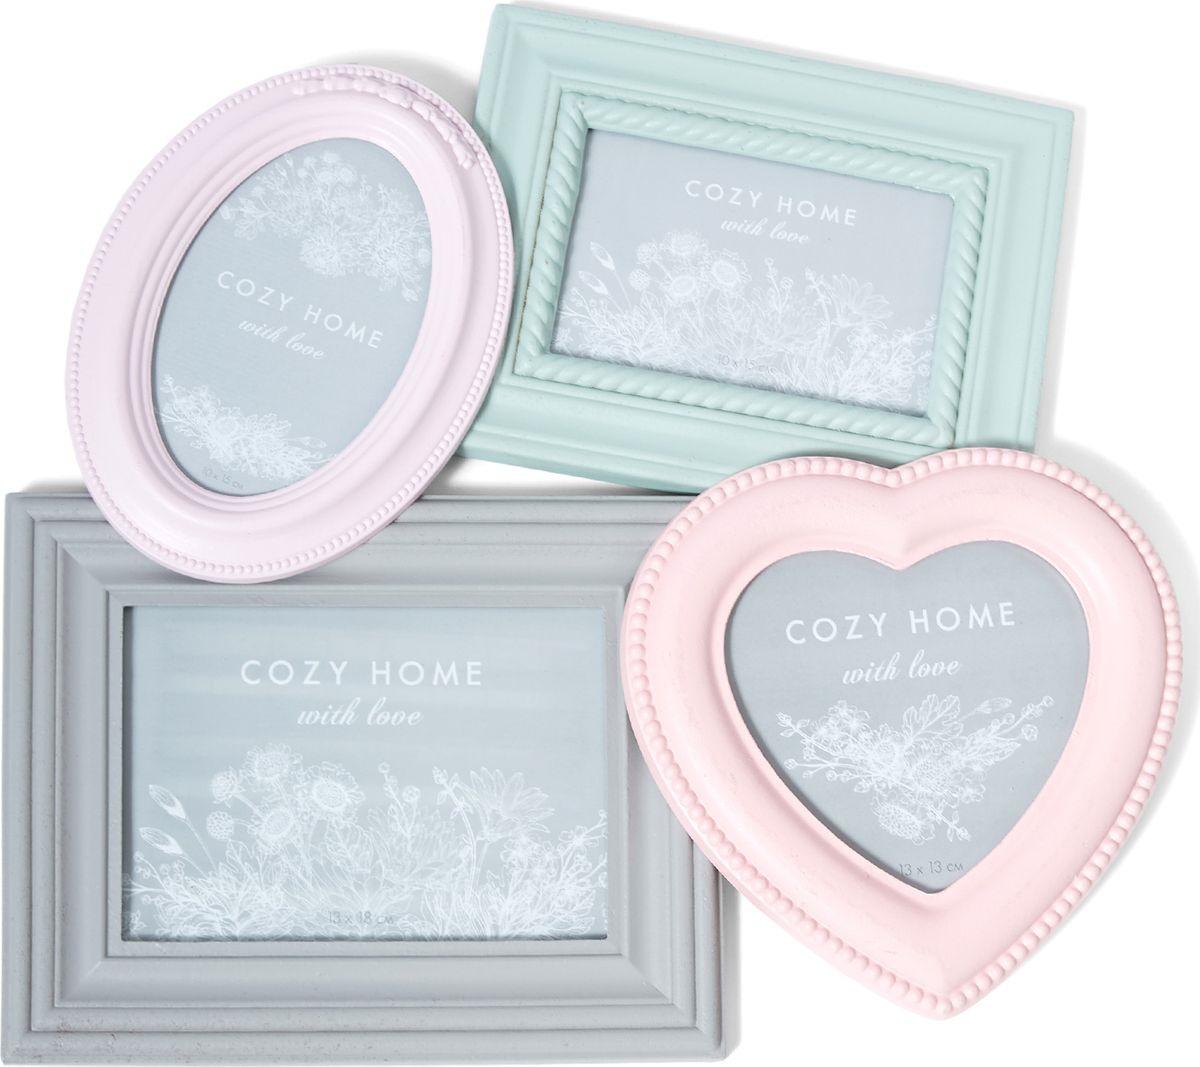 Фоторамка Cozy Home Cheerful Mood, 505504, мятный, розовый, 42 х 40 х 4 см плед детский cozy home сhicca цвет розовый 70 х 100 см